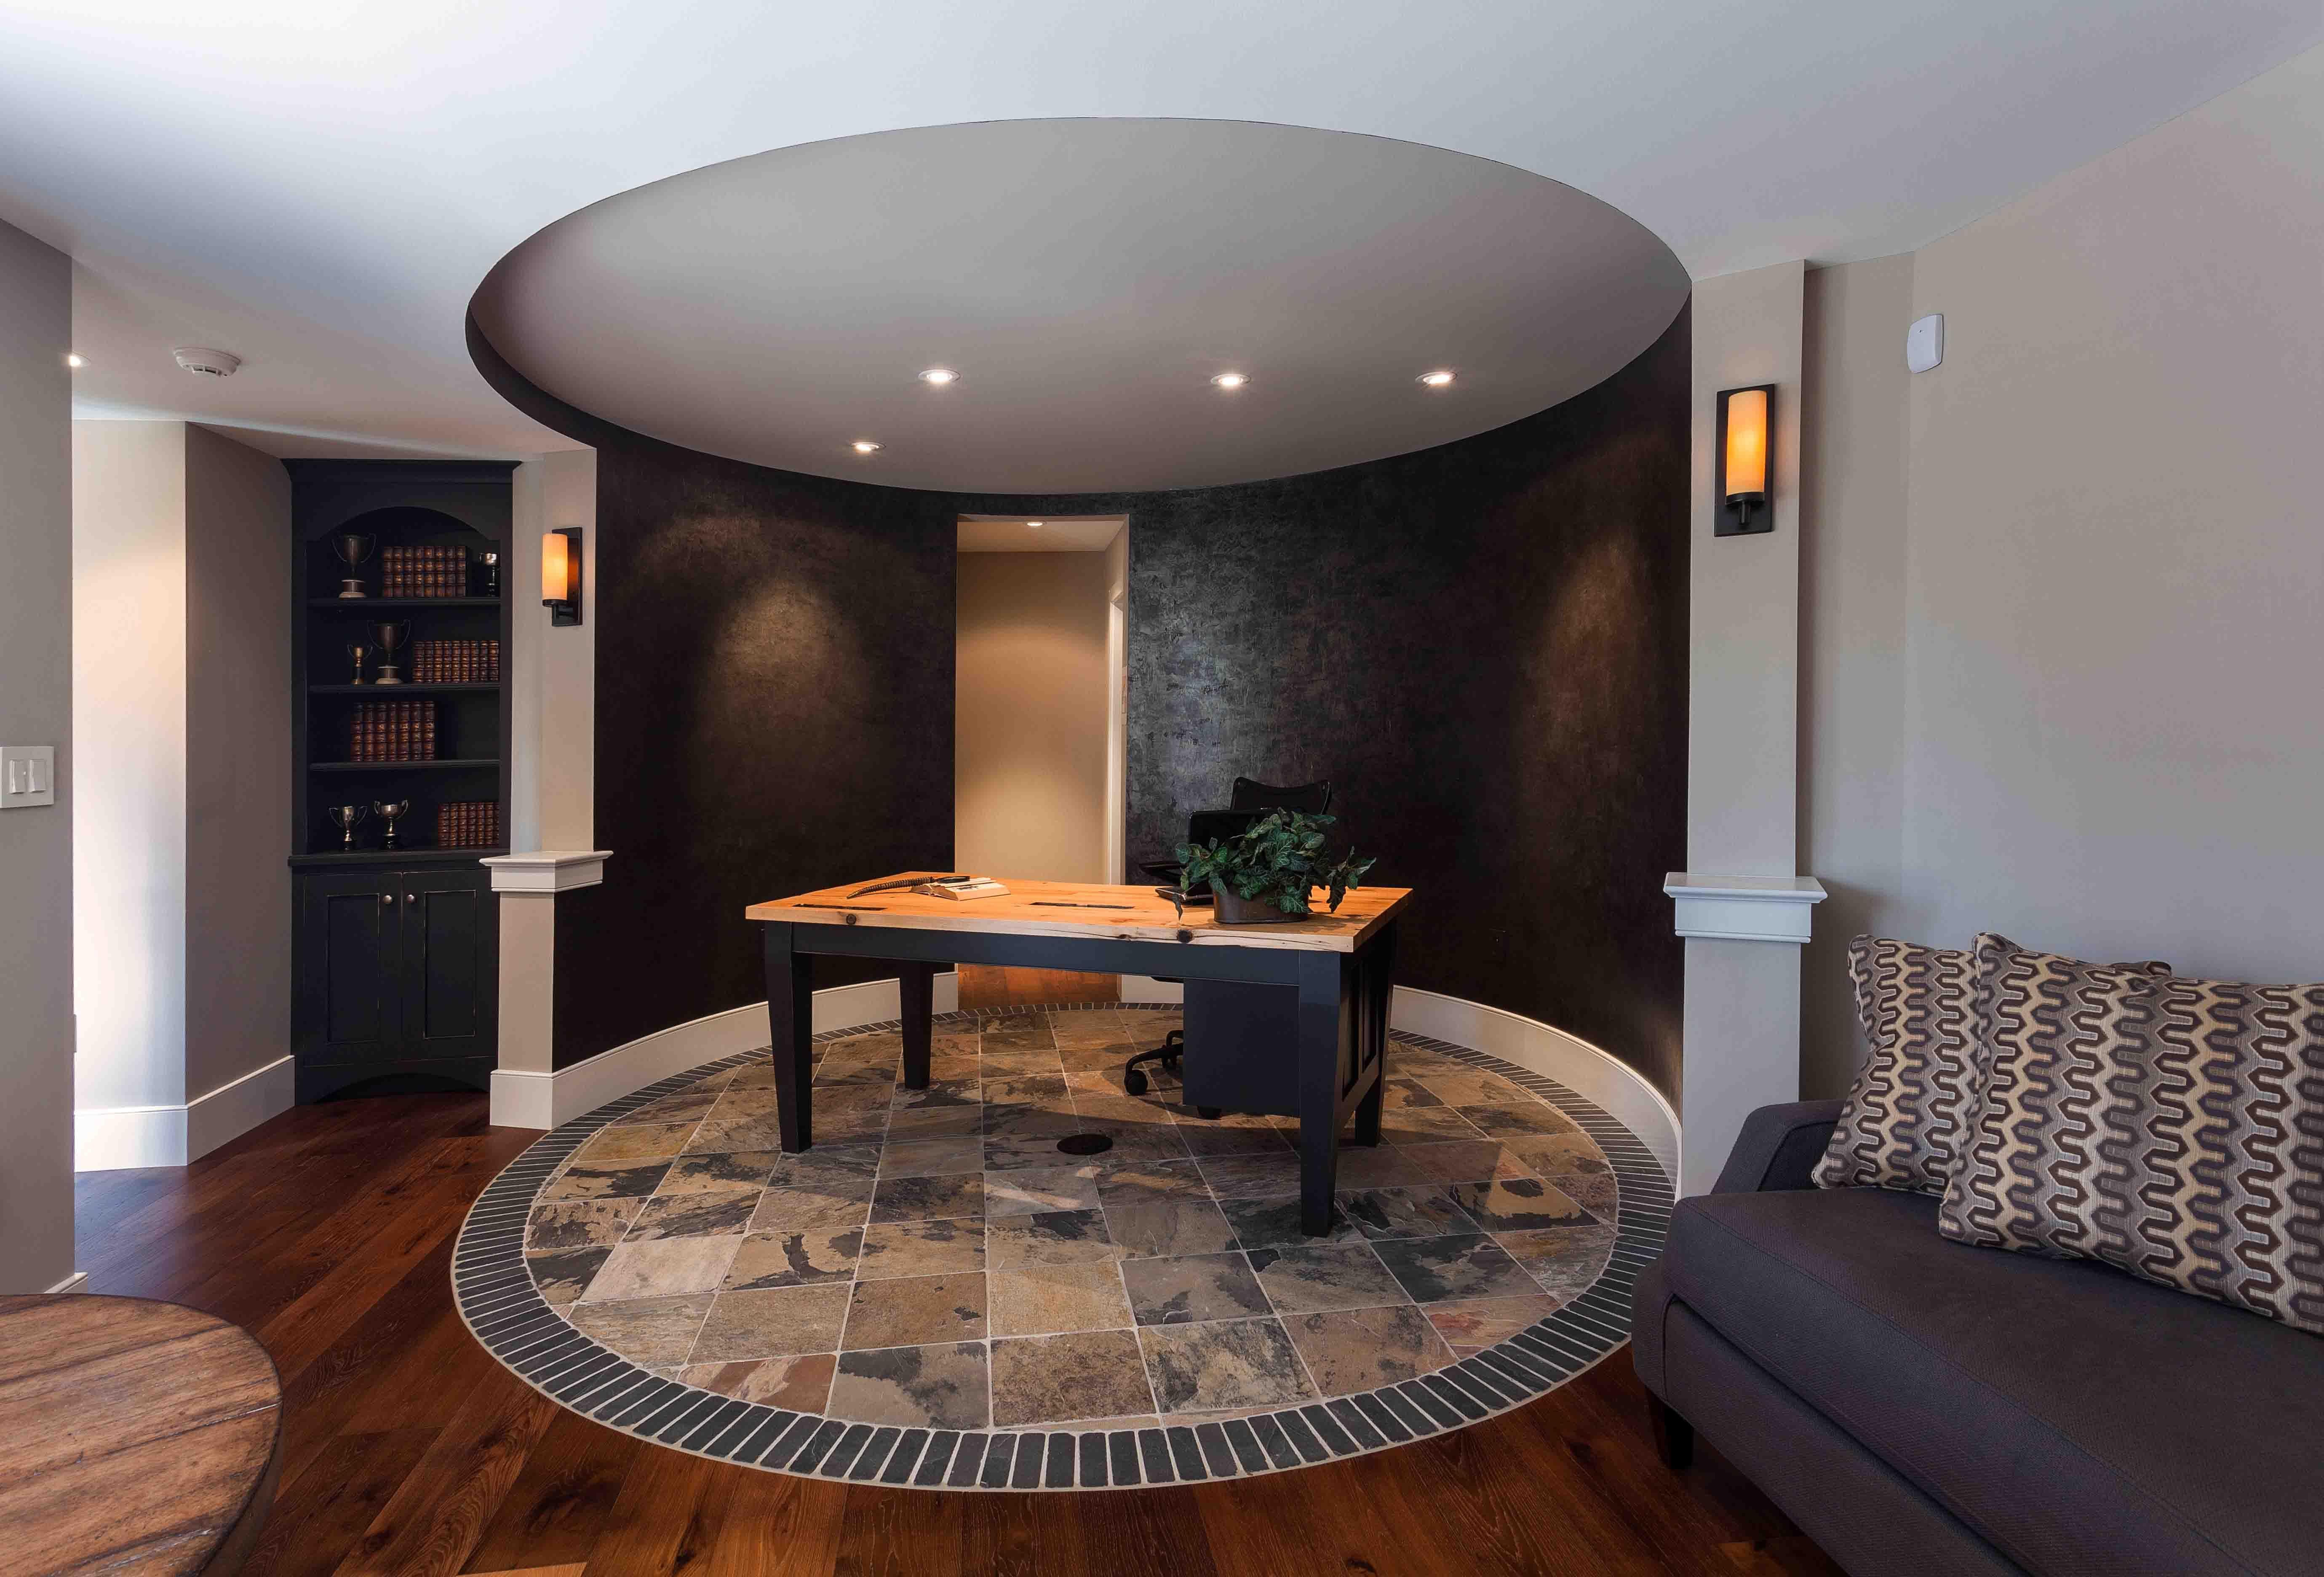 Tour Behind Doors Decor Design Home Decor Decor